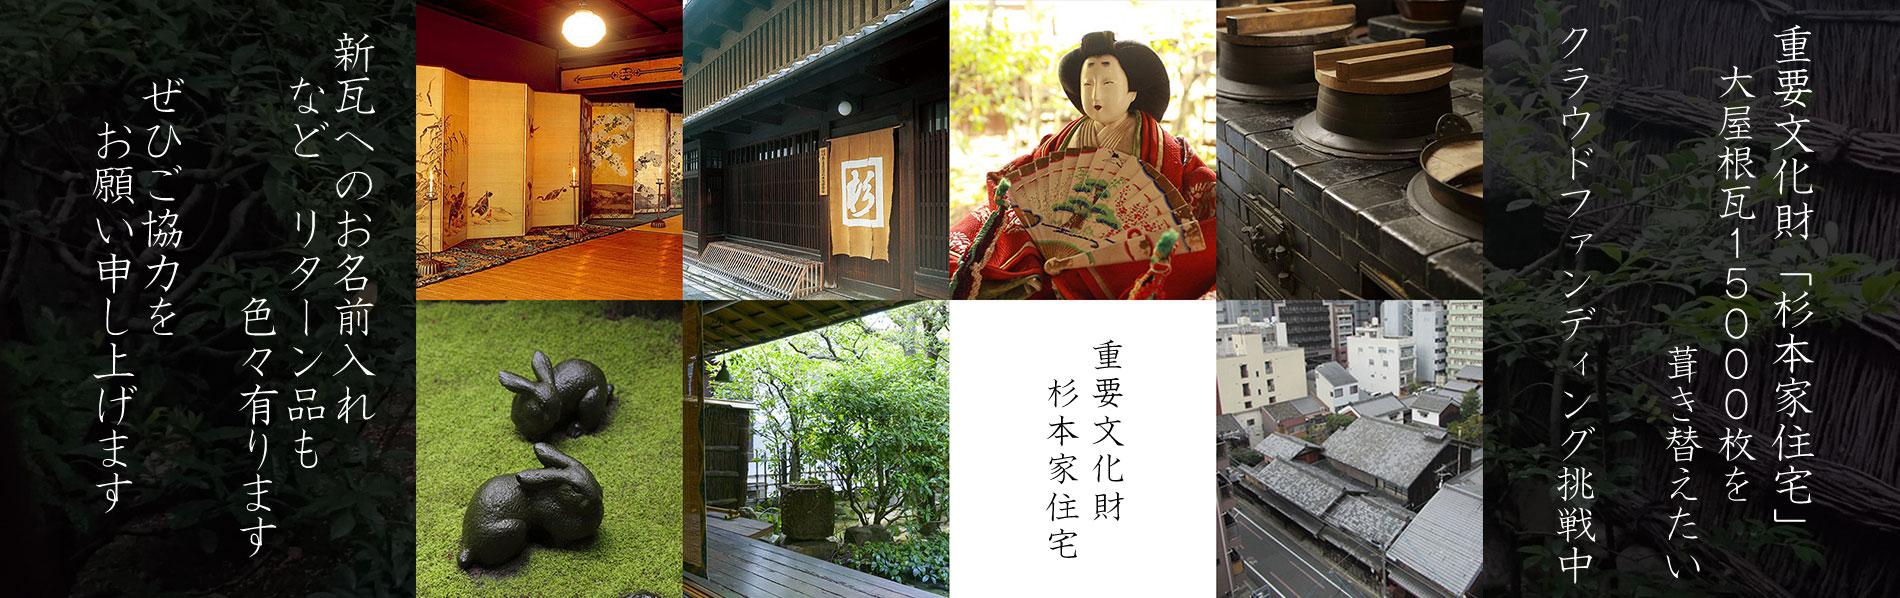 http://www.sugimotoke.or.jp/2021/03/01/news20210227/